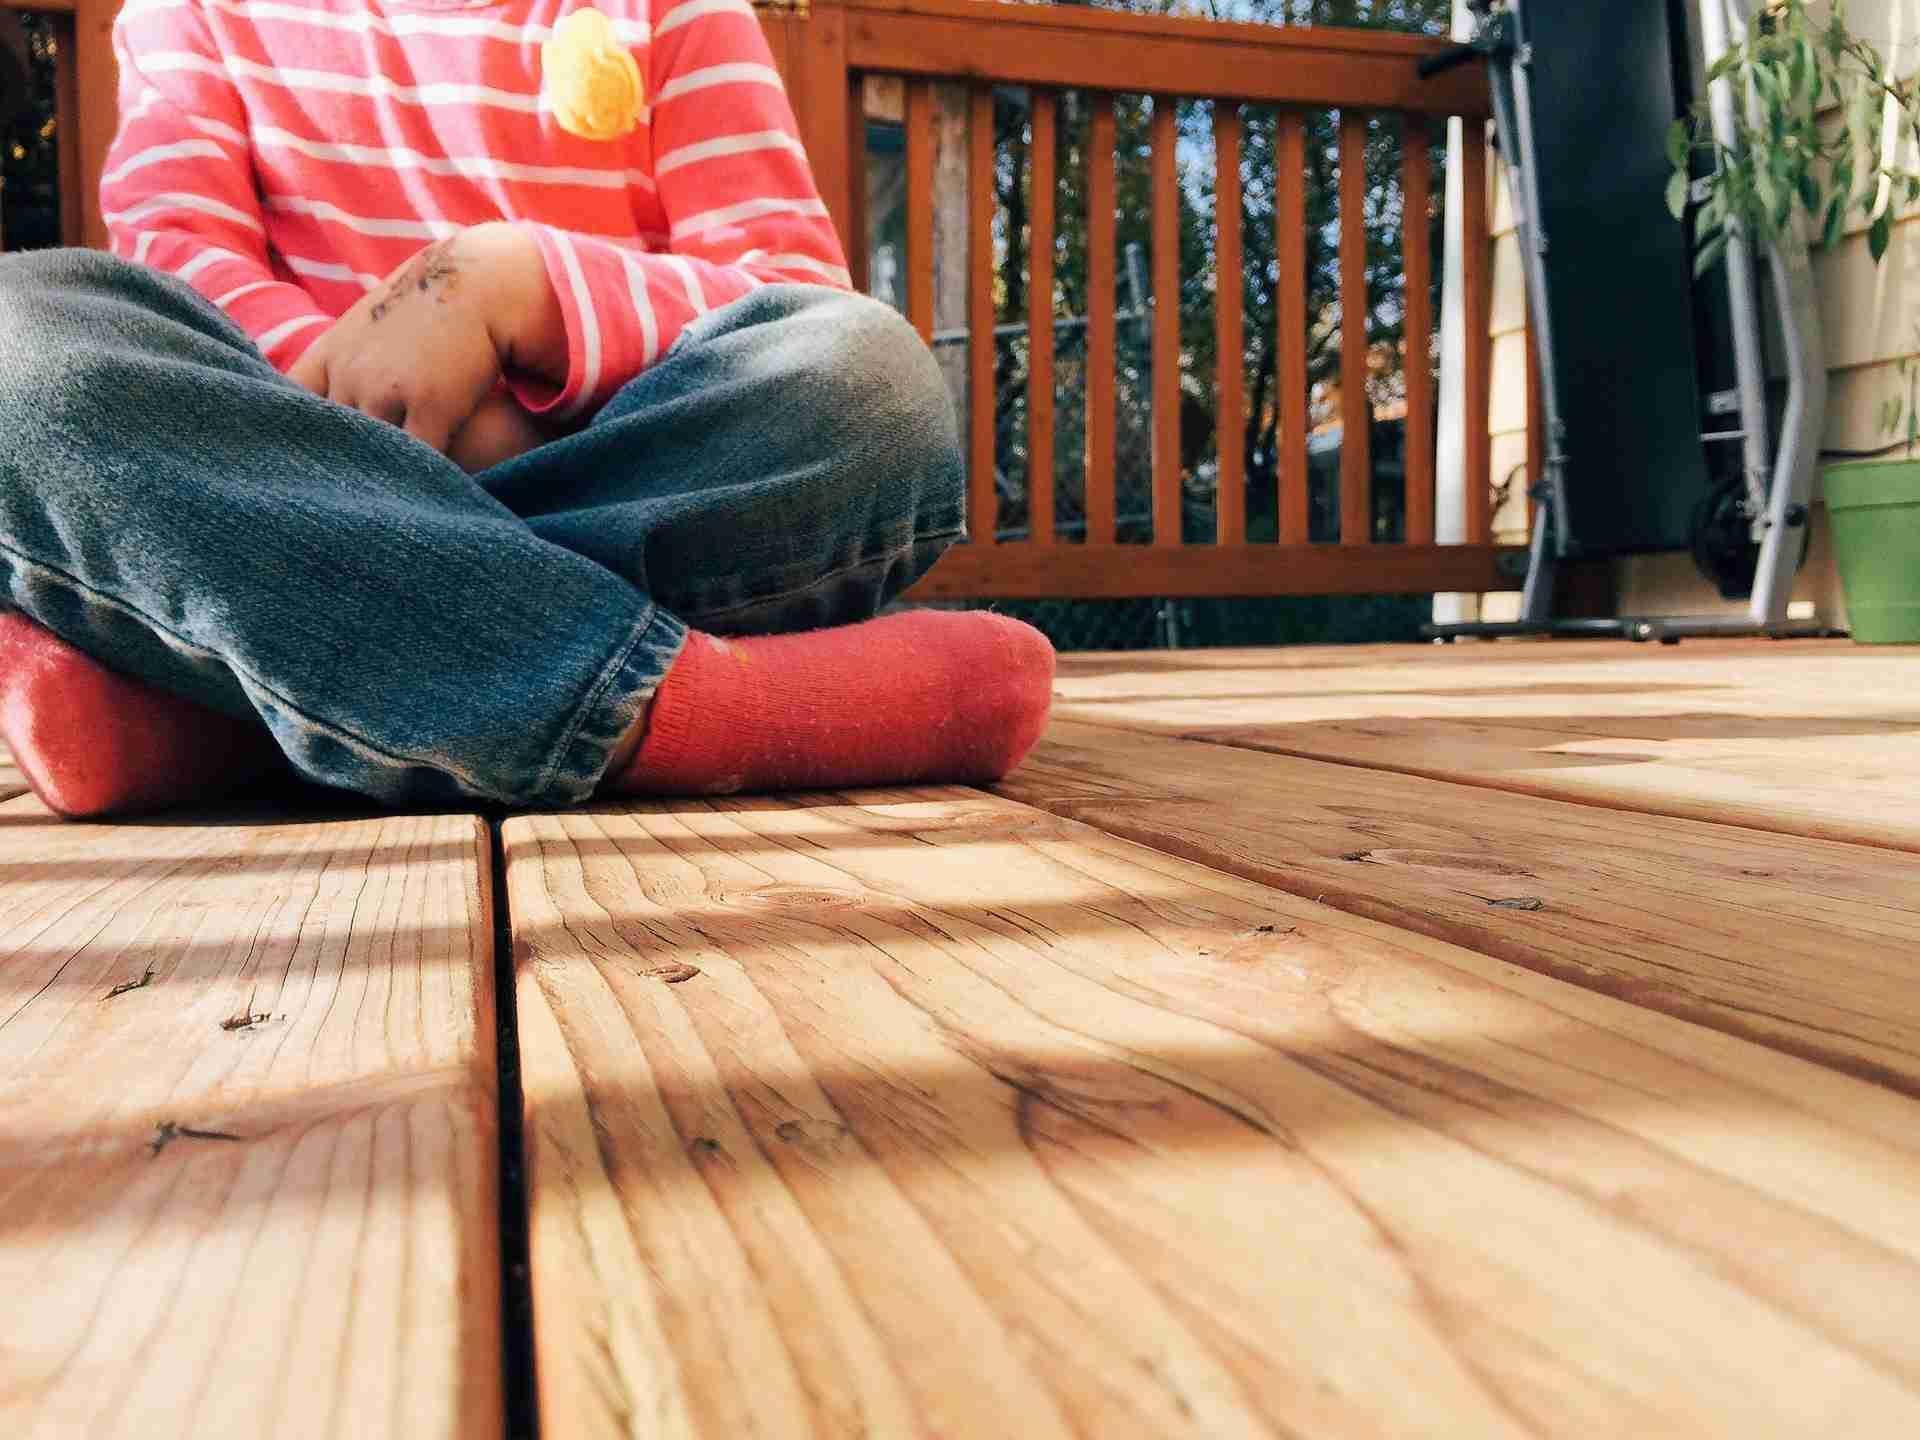 Hoe lang blijft steigerhout buiten goed?